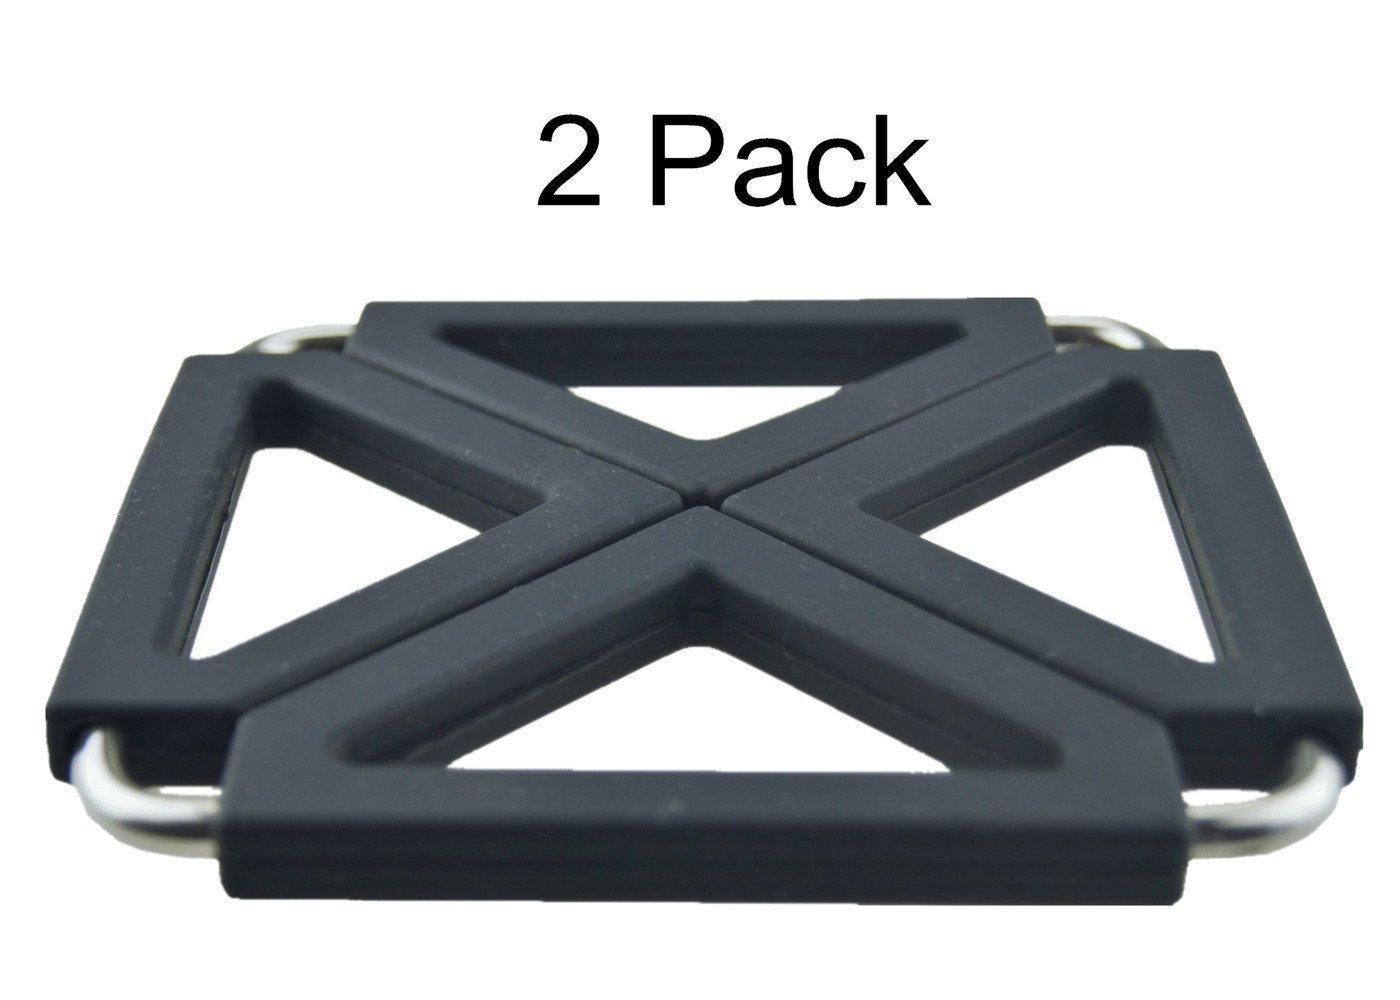 COJOY Expandable Silicone & Metal Trivet Mat, Hot Pot Holder Pads, 6.3'' Square Black, Set of 2